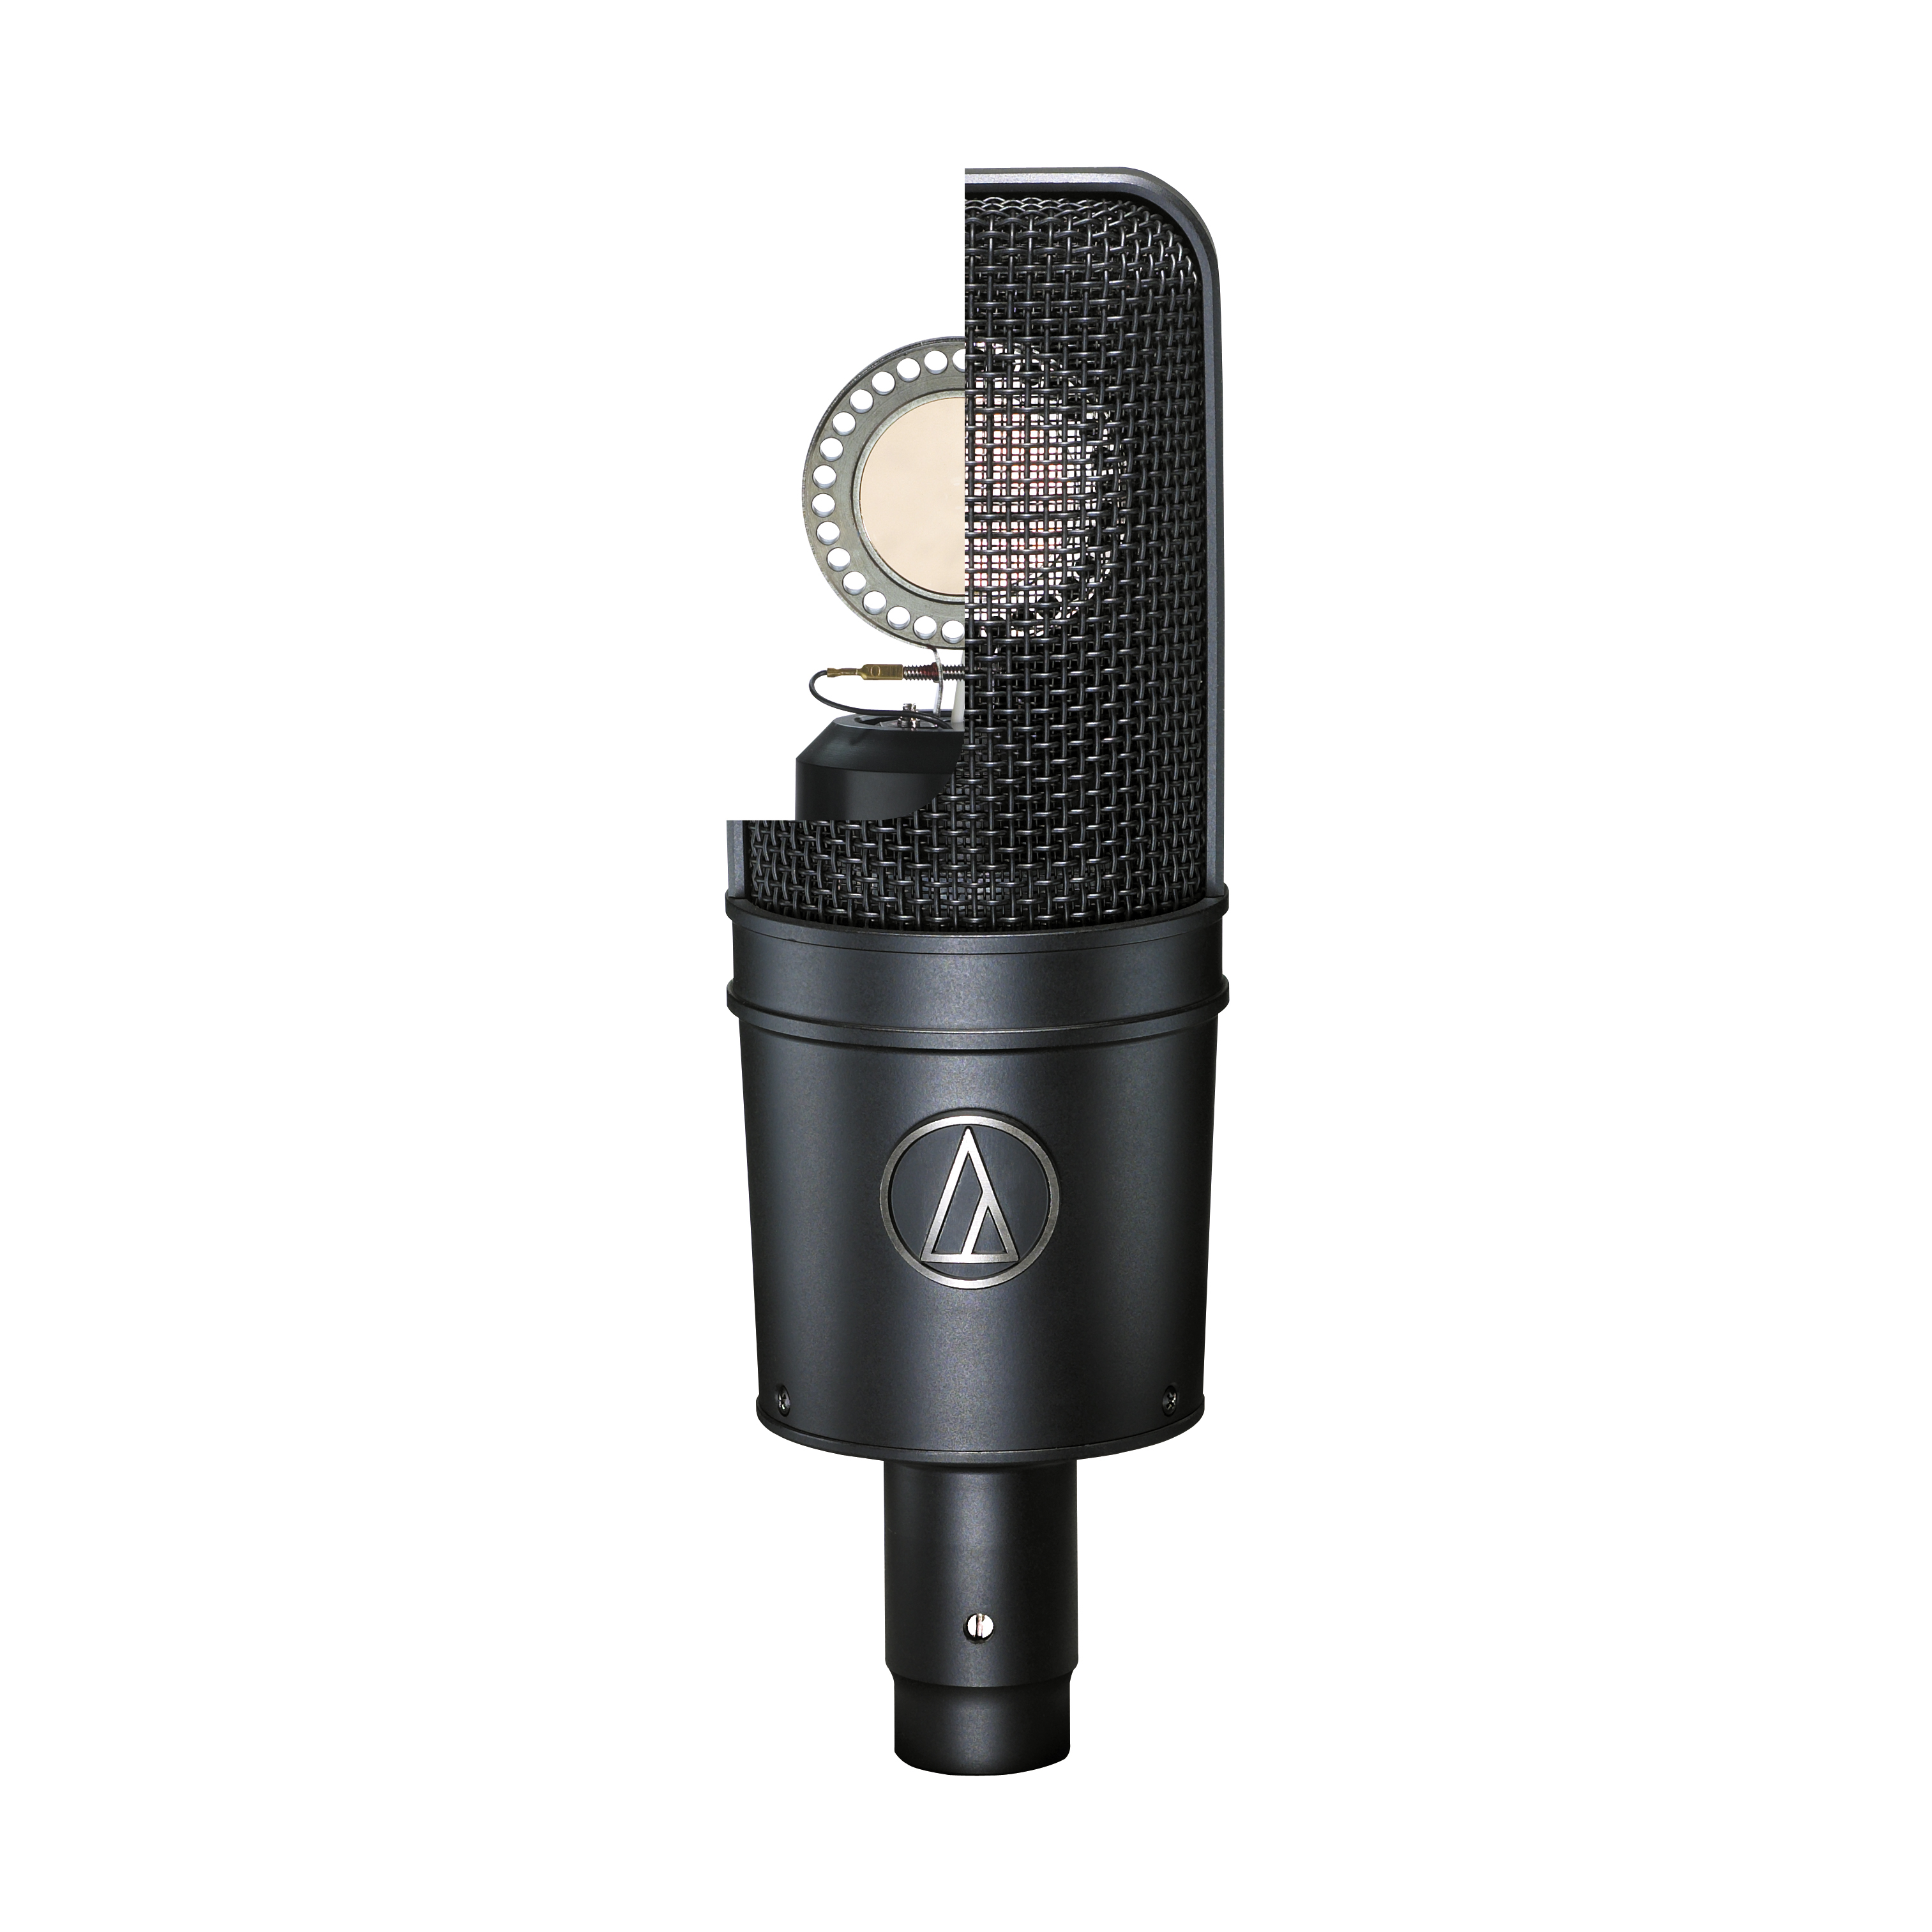 Audio-Technica AT4040 Cardioid Condenser Microphone | eBay